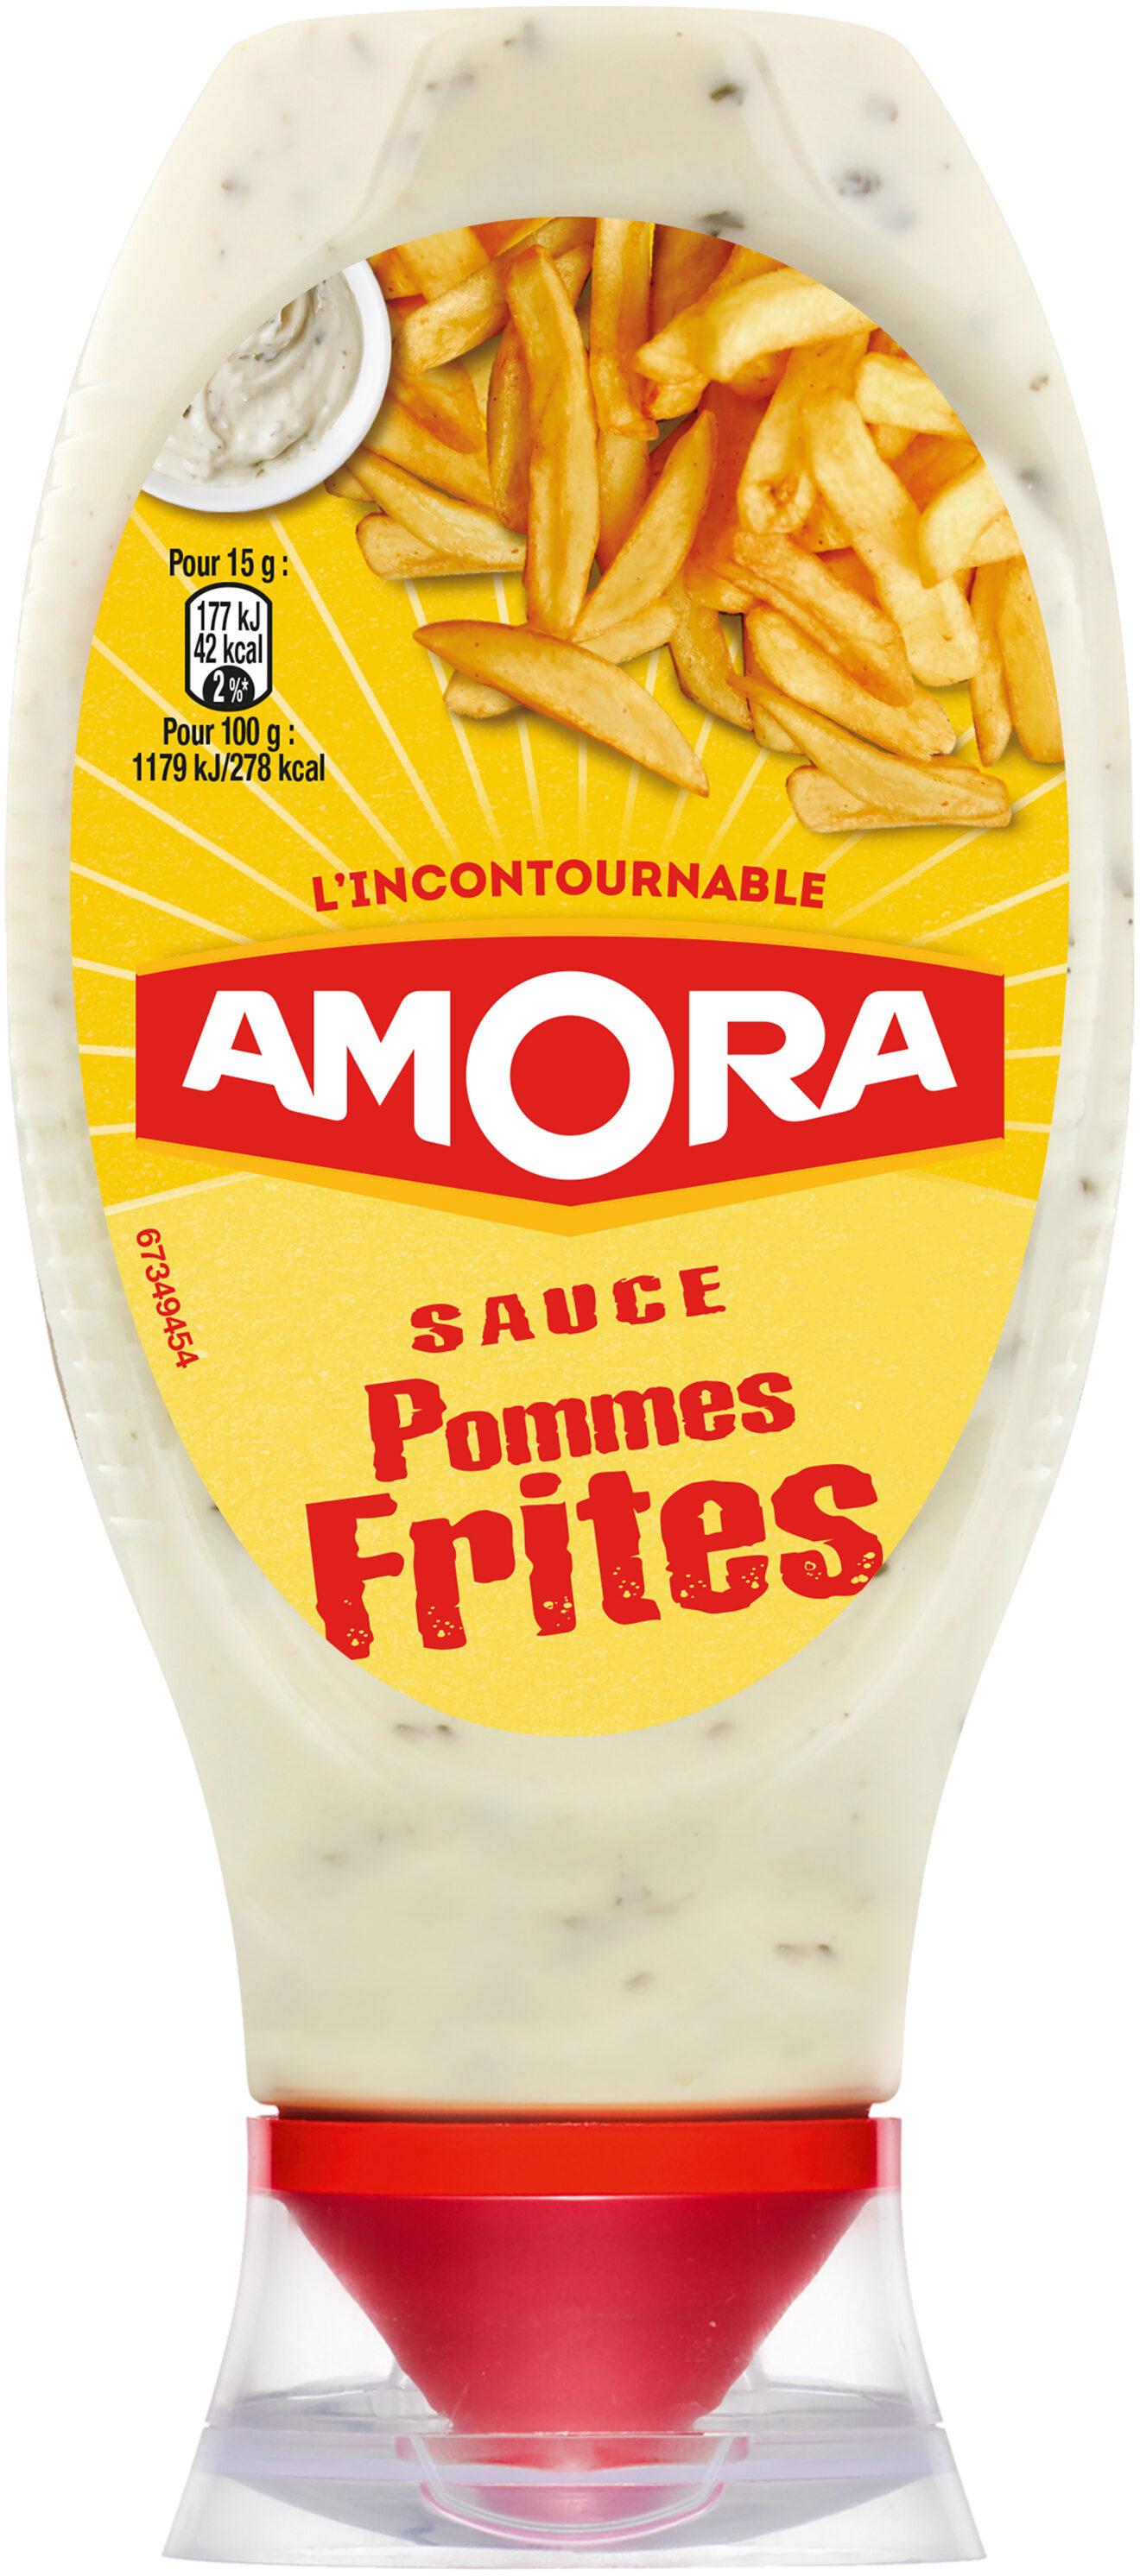 Amora Sauce Pommes Frites Flacon Souple 448g - Produit - fr